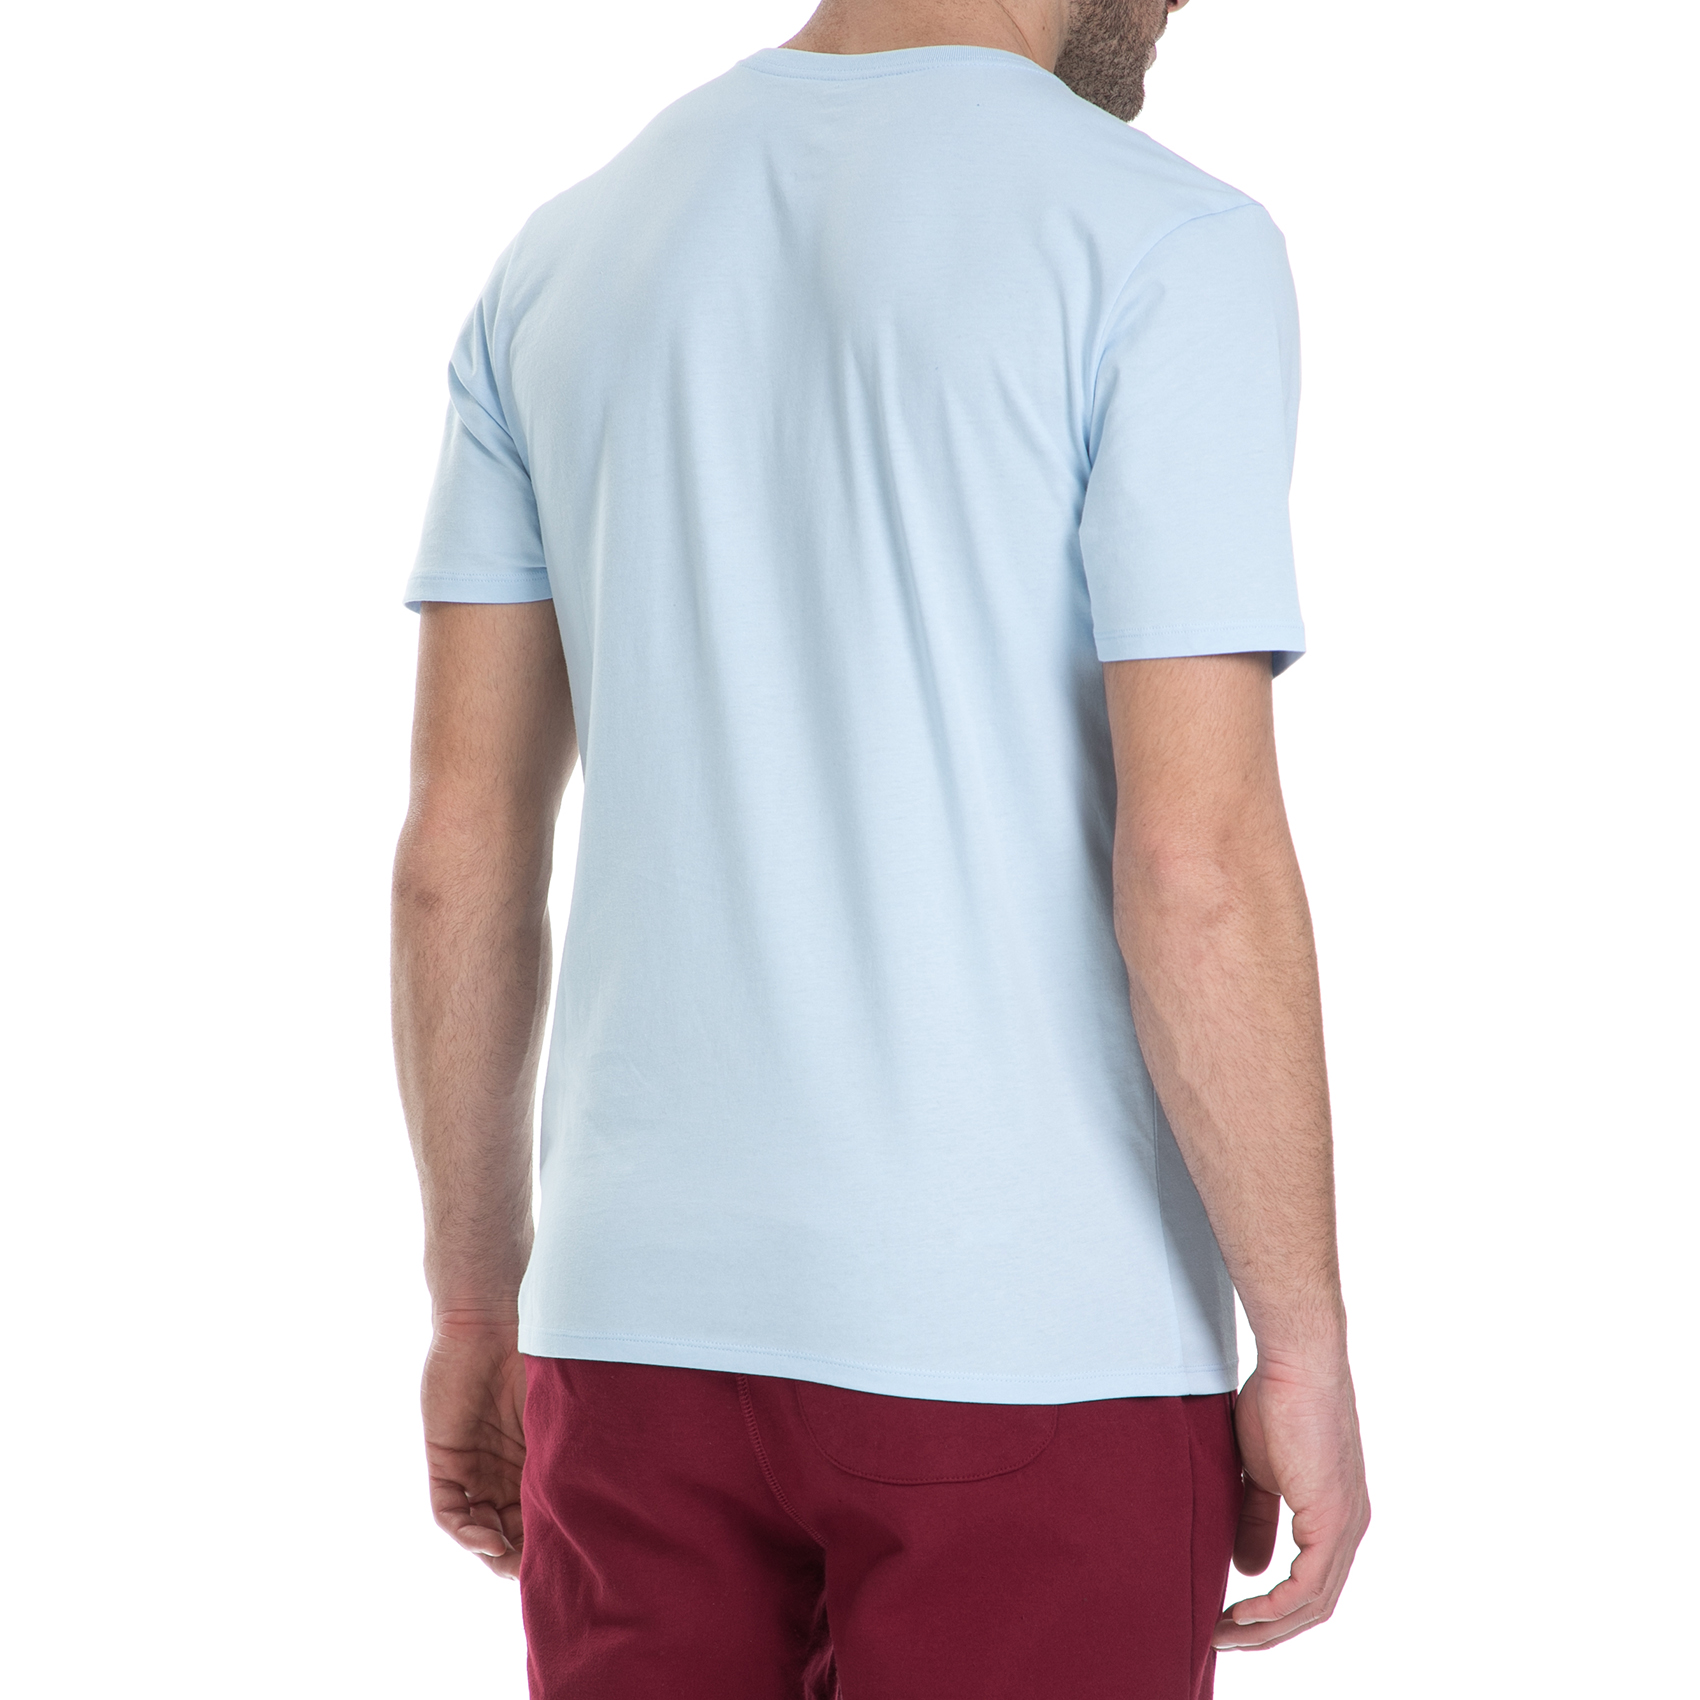 NIKE - Κοντομάνικη μπλούζα Nike Air Jordan γαλάζια